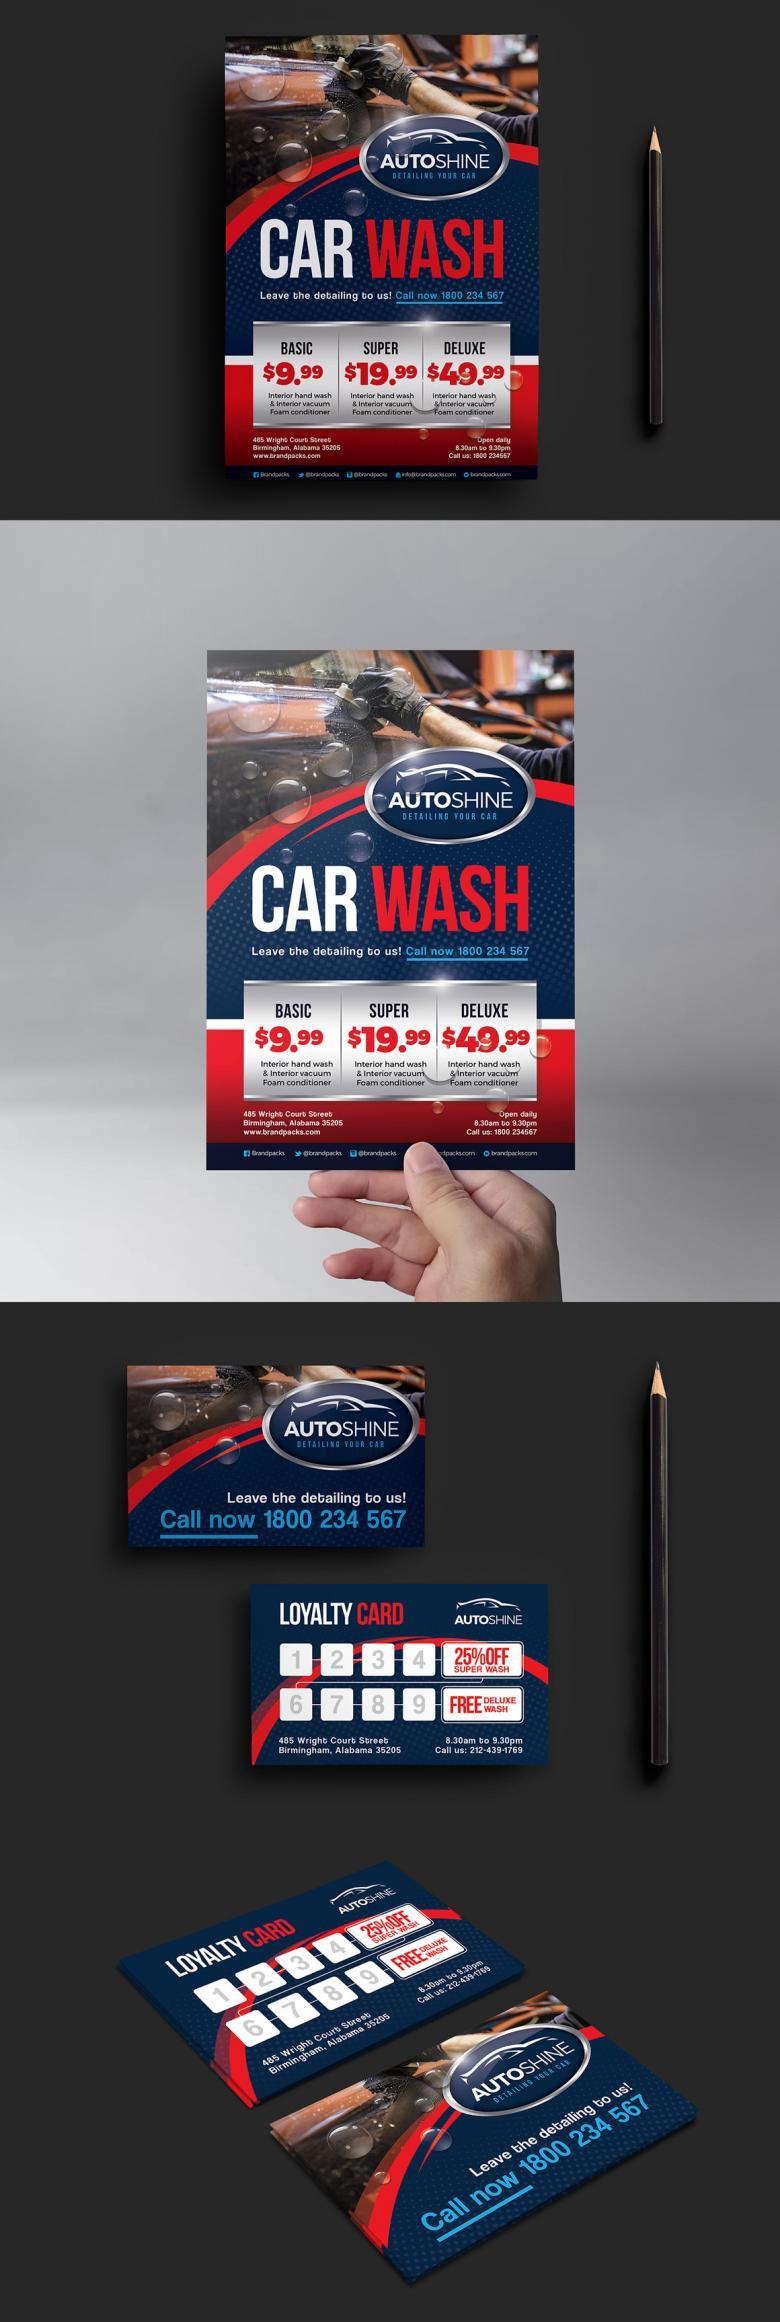 Free Car Wash Templates Mini Pack Print